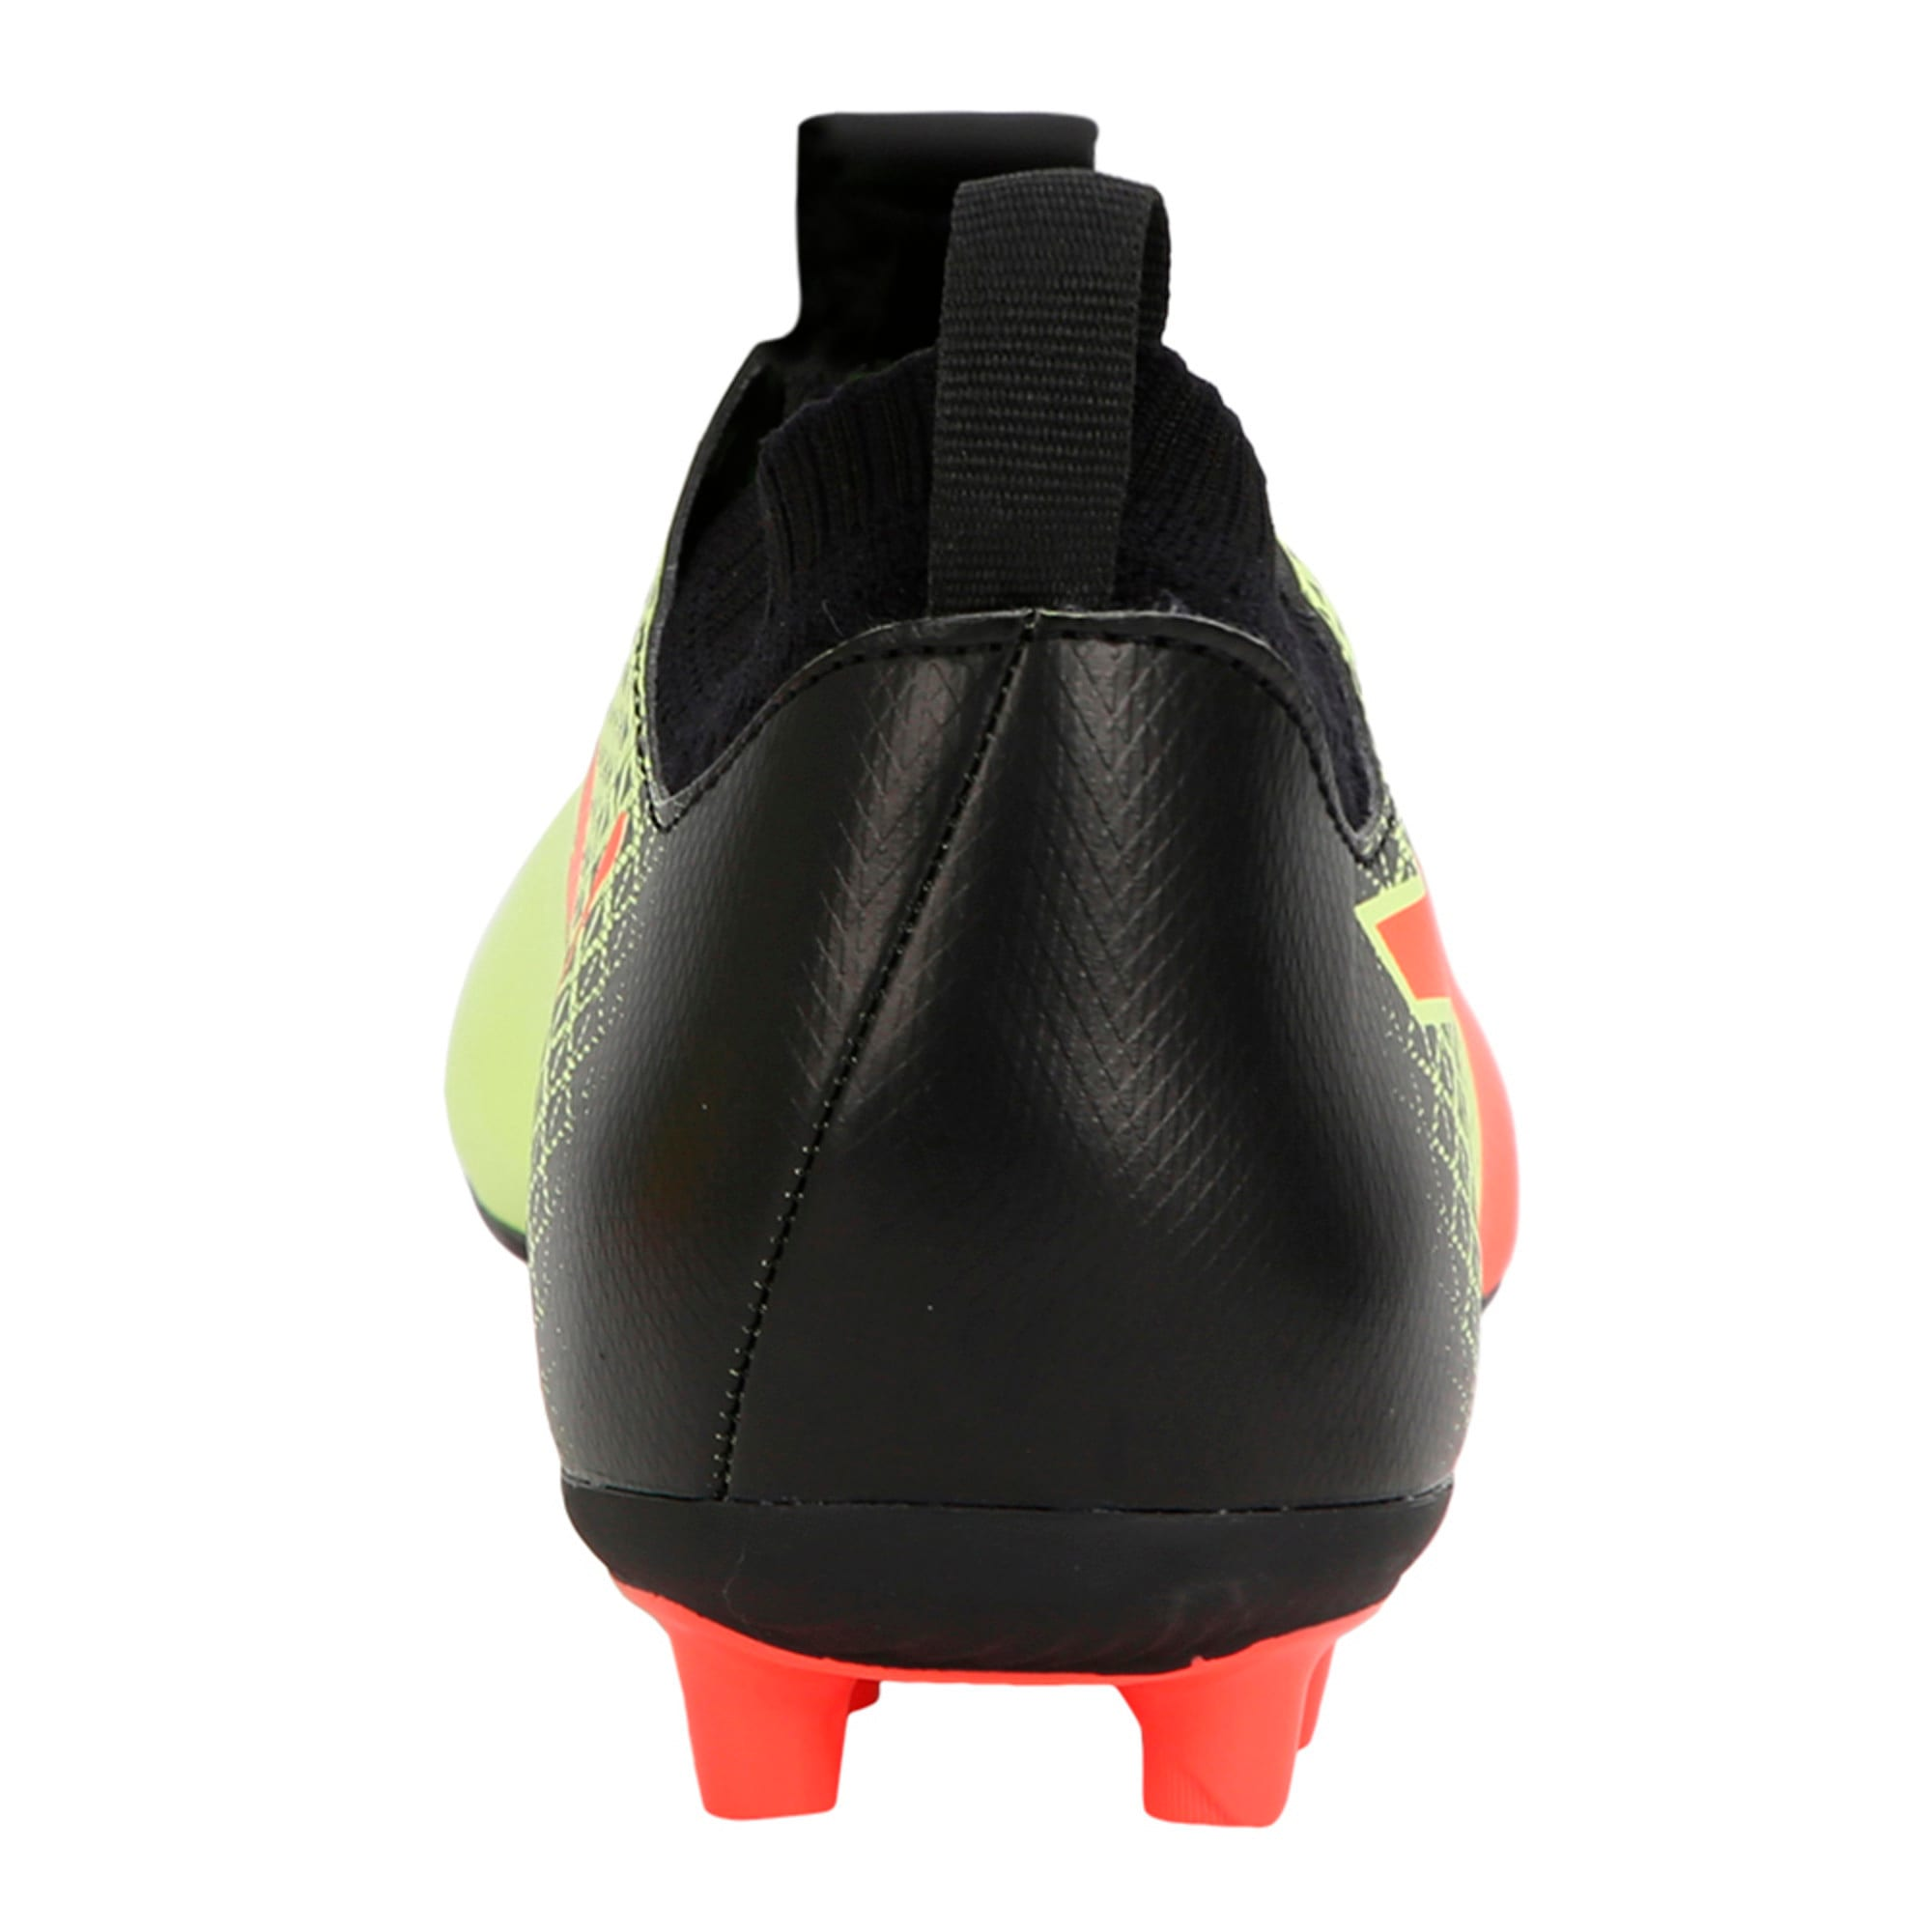 Thumbnail 5 of evoKNIT FG Men's Football Boots, Yellow-Red-Black, medium-IND